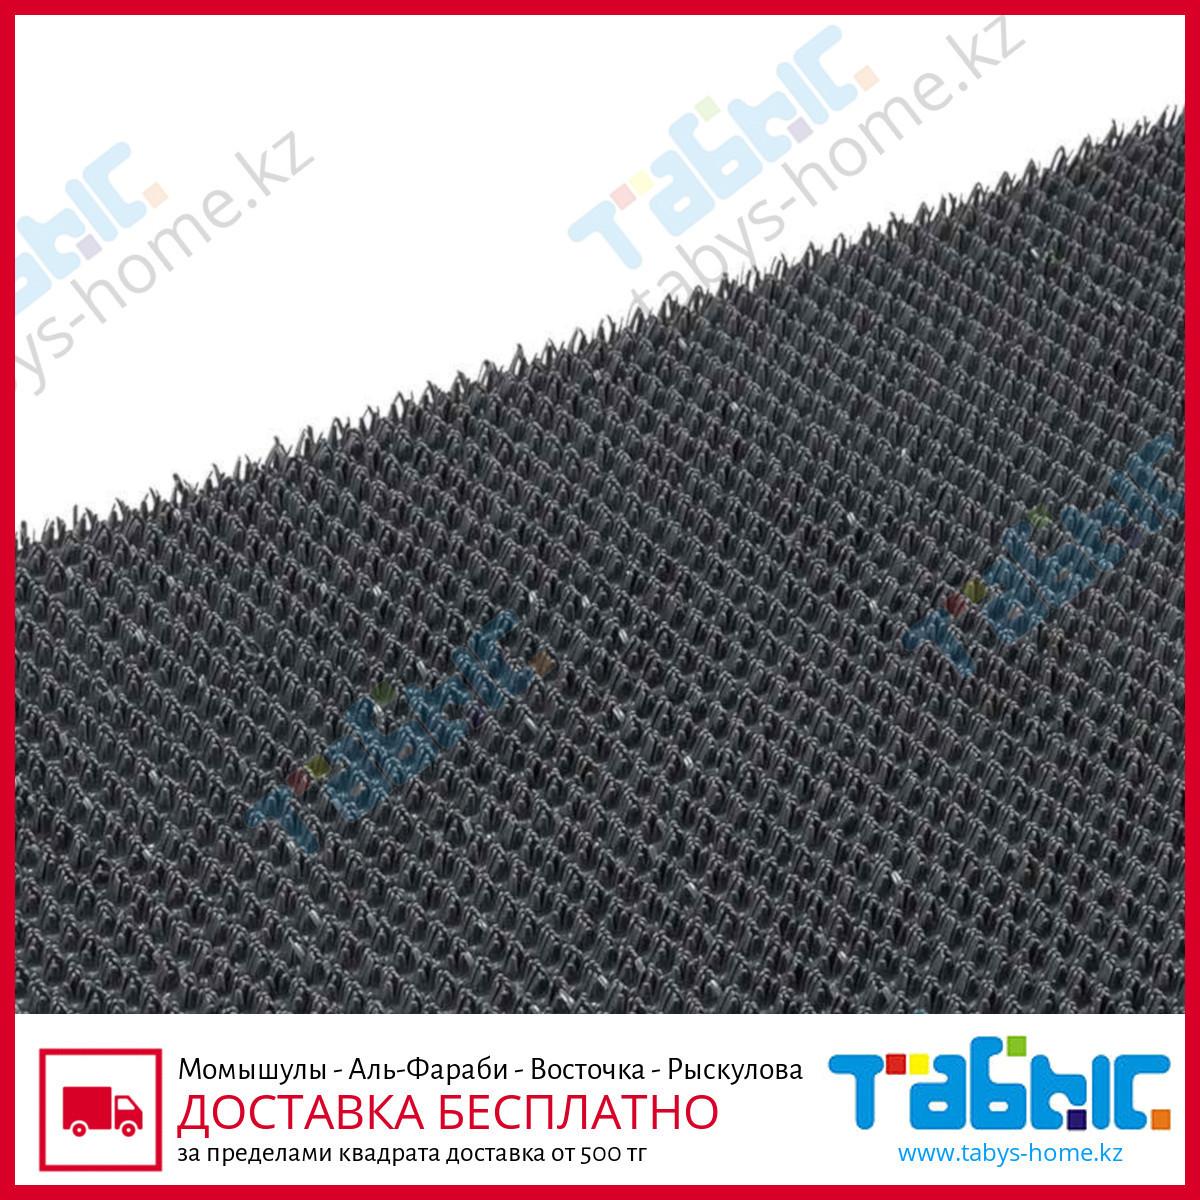 Коврик щетинистый Стандарт 90х1500 см (темно-серый цвет)